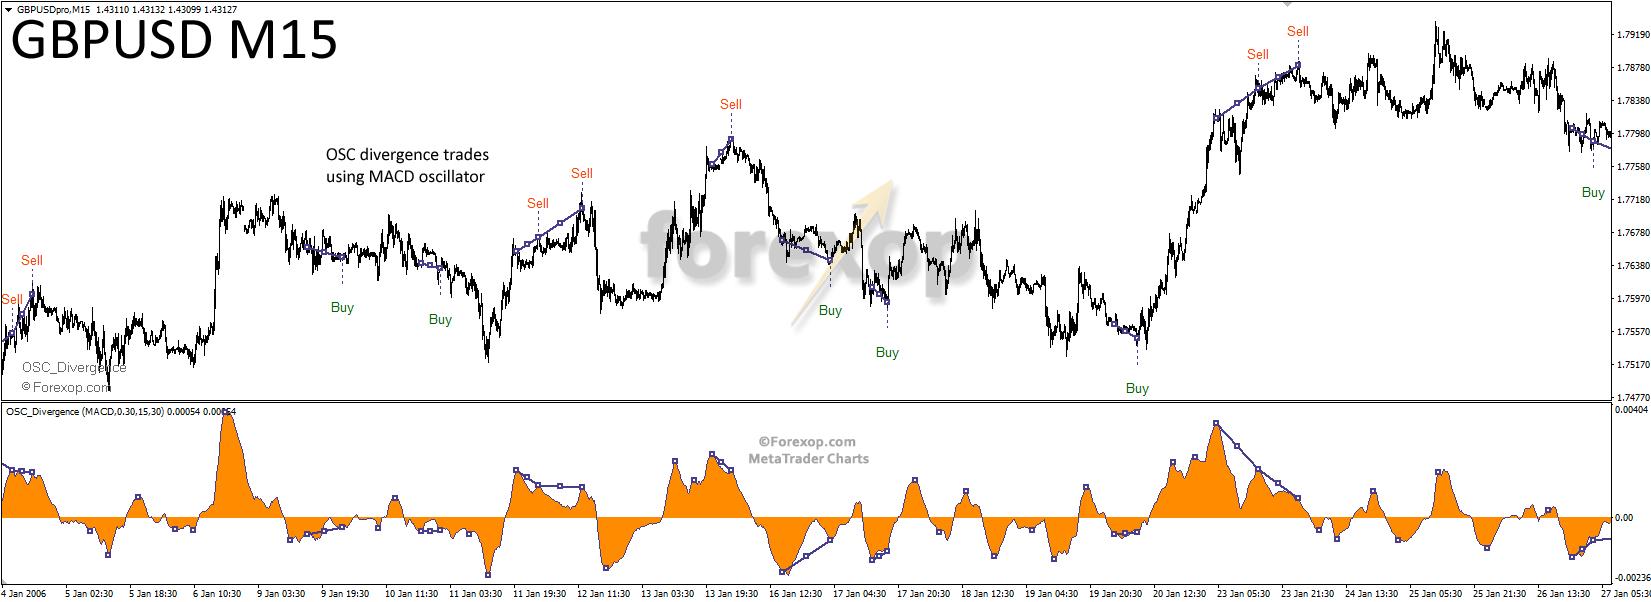 Figure 8: Using OSC divergence on fifteen minute chart (M15)